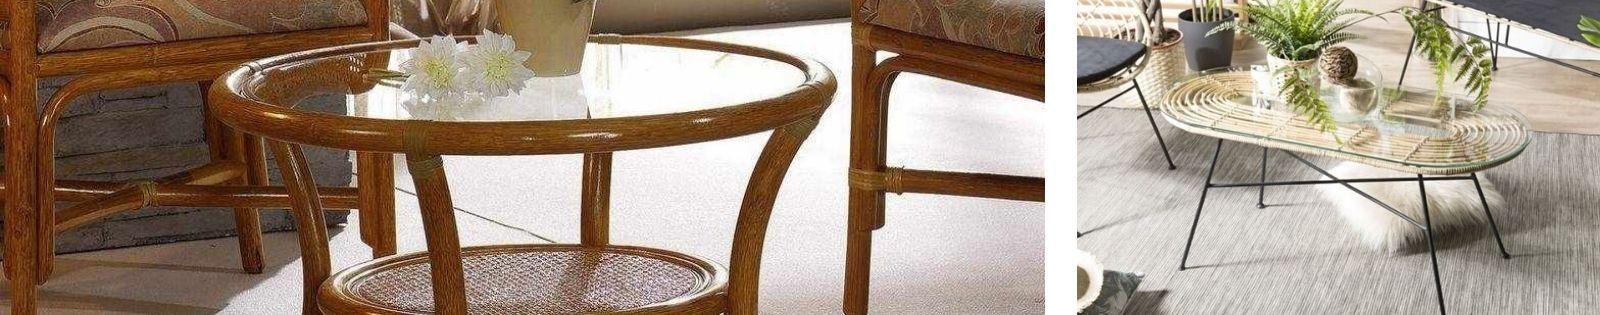 Table basse en rotin Haut de Gamme de fabrication artisanale.